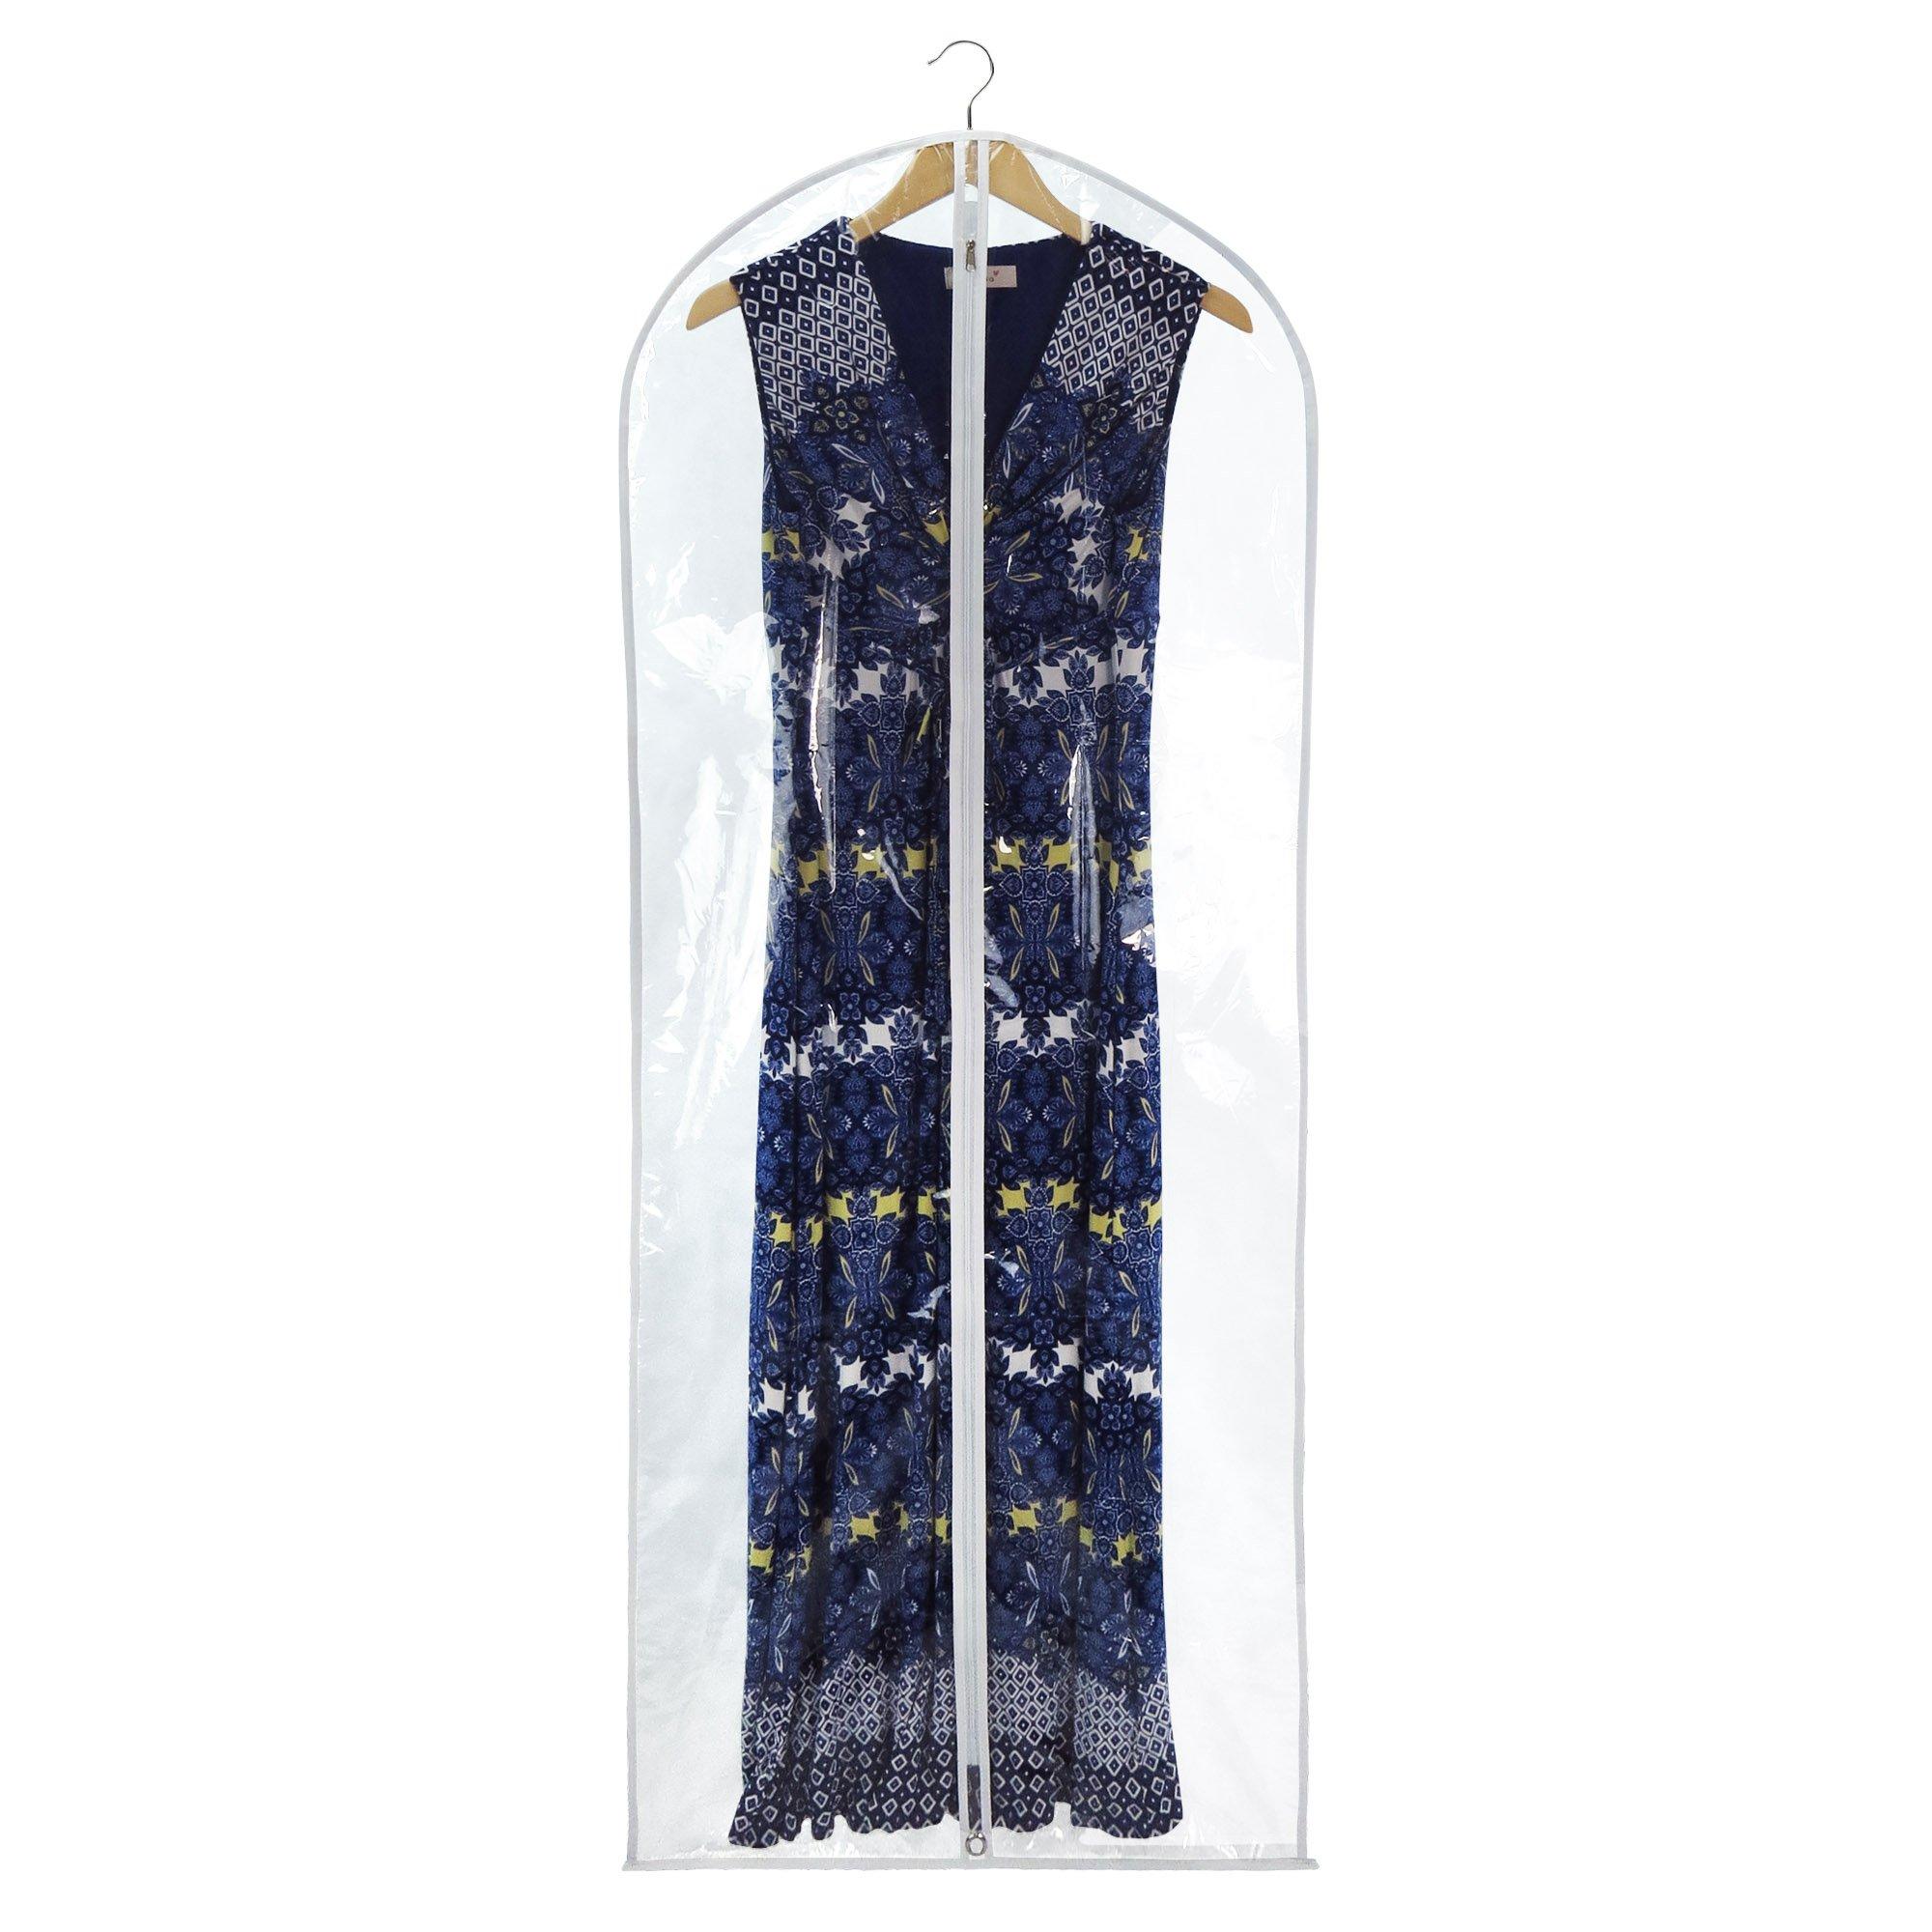 HANGERWORLD 6 Clear Showerproof 60in Whitetrim Zip Garment Cover Clothes Bags